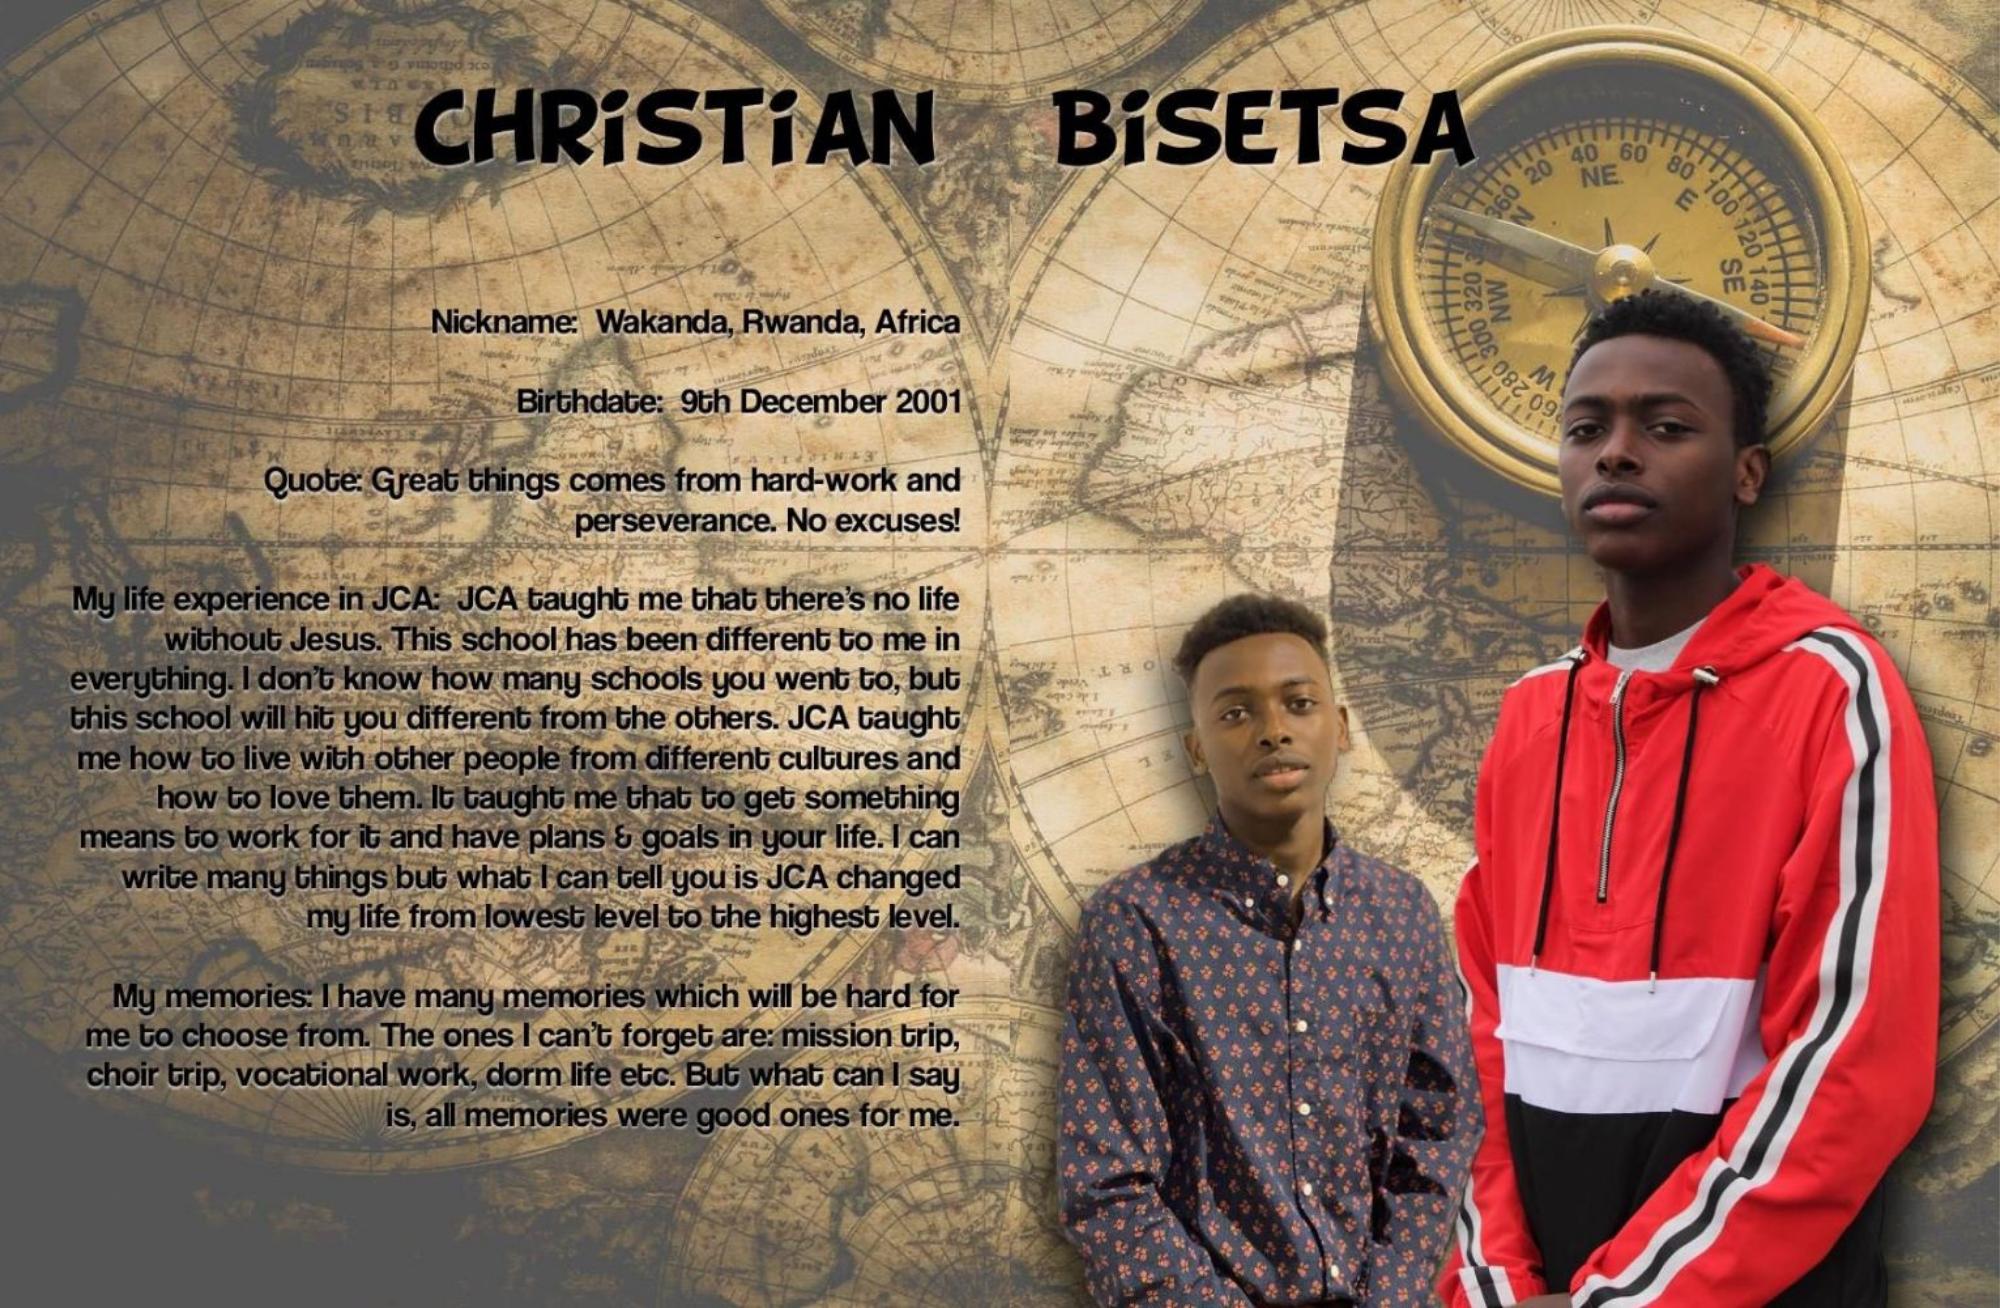 Bisetsa, Christian